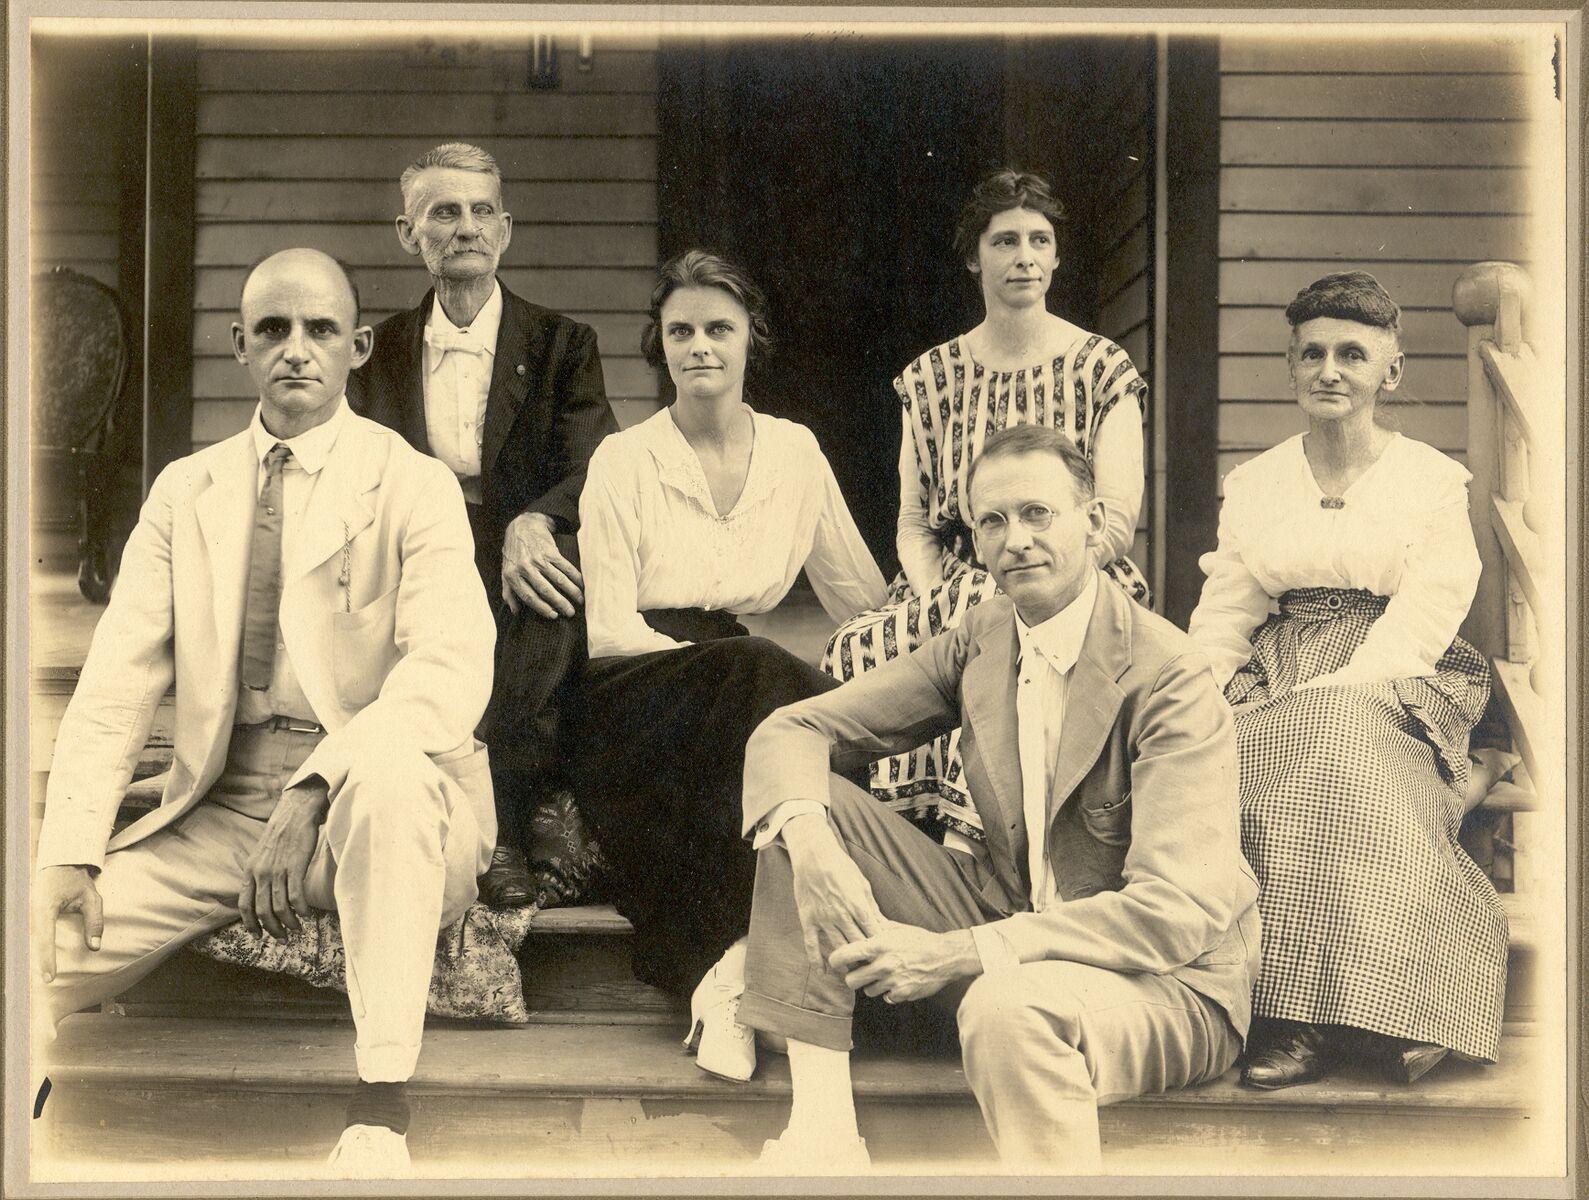 Lowell Family, Holton, Kansas